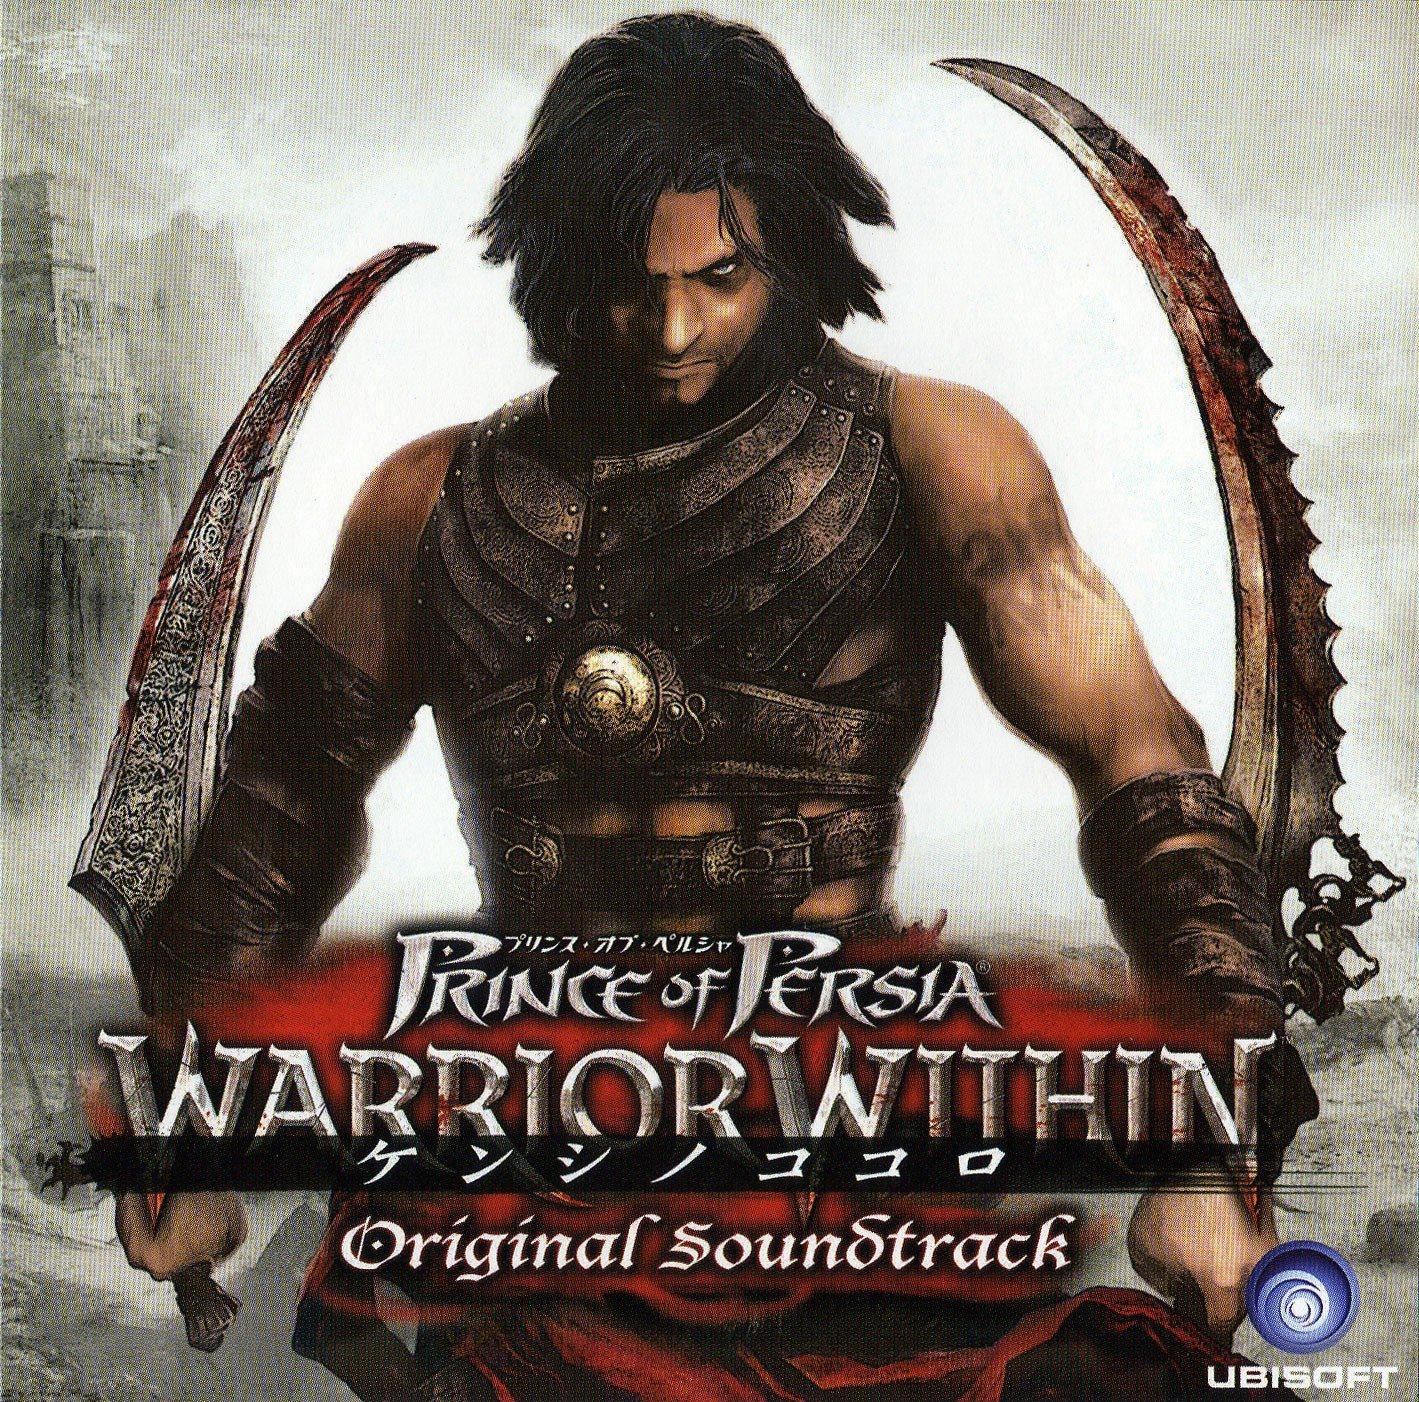 Stuart Chatwood album Prince of Persia: Warrior Within Original Soundtrack